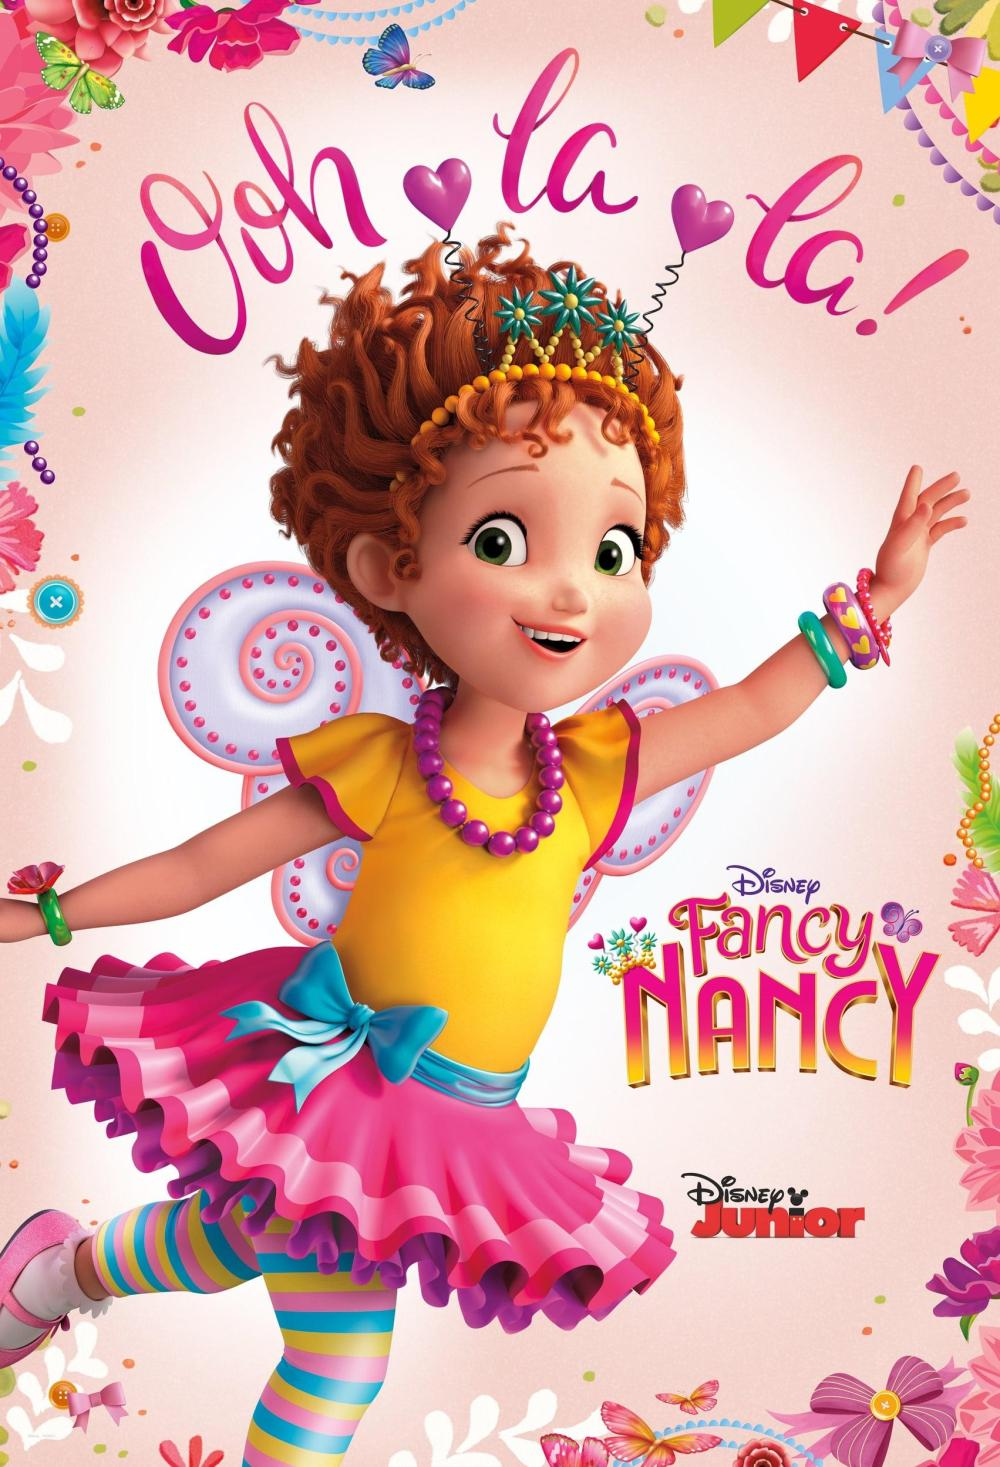 medium resolution of disney junior fancy nancy is fantastique page 2 of 0 with